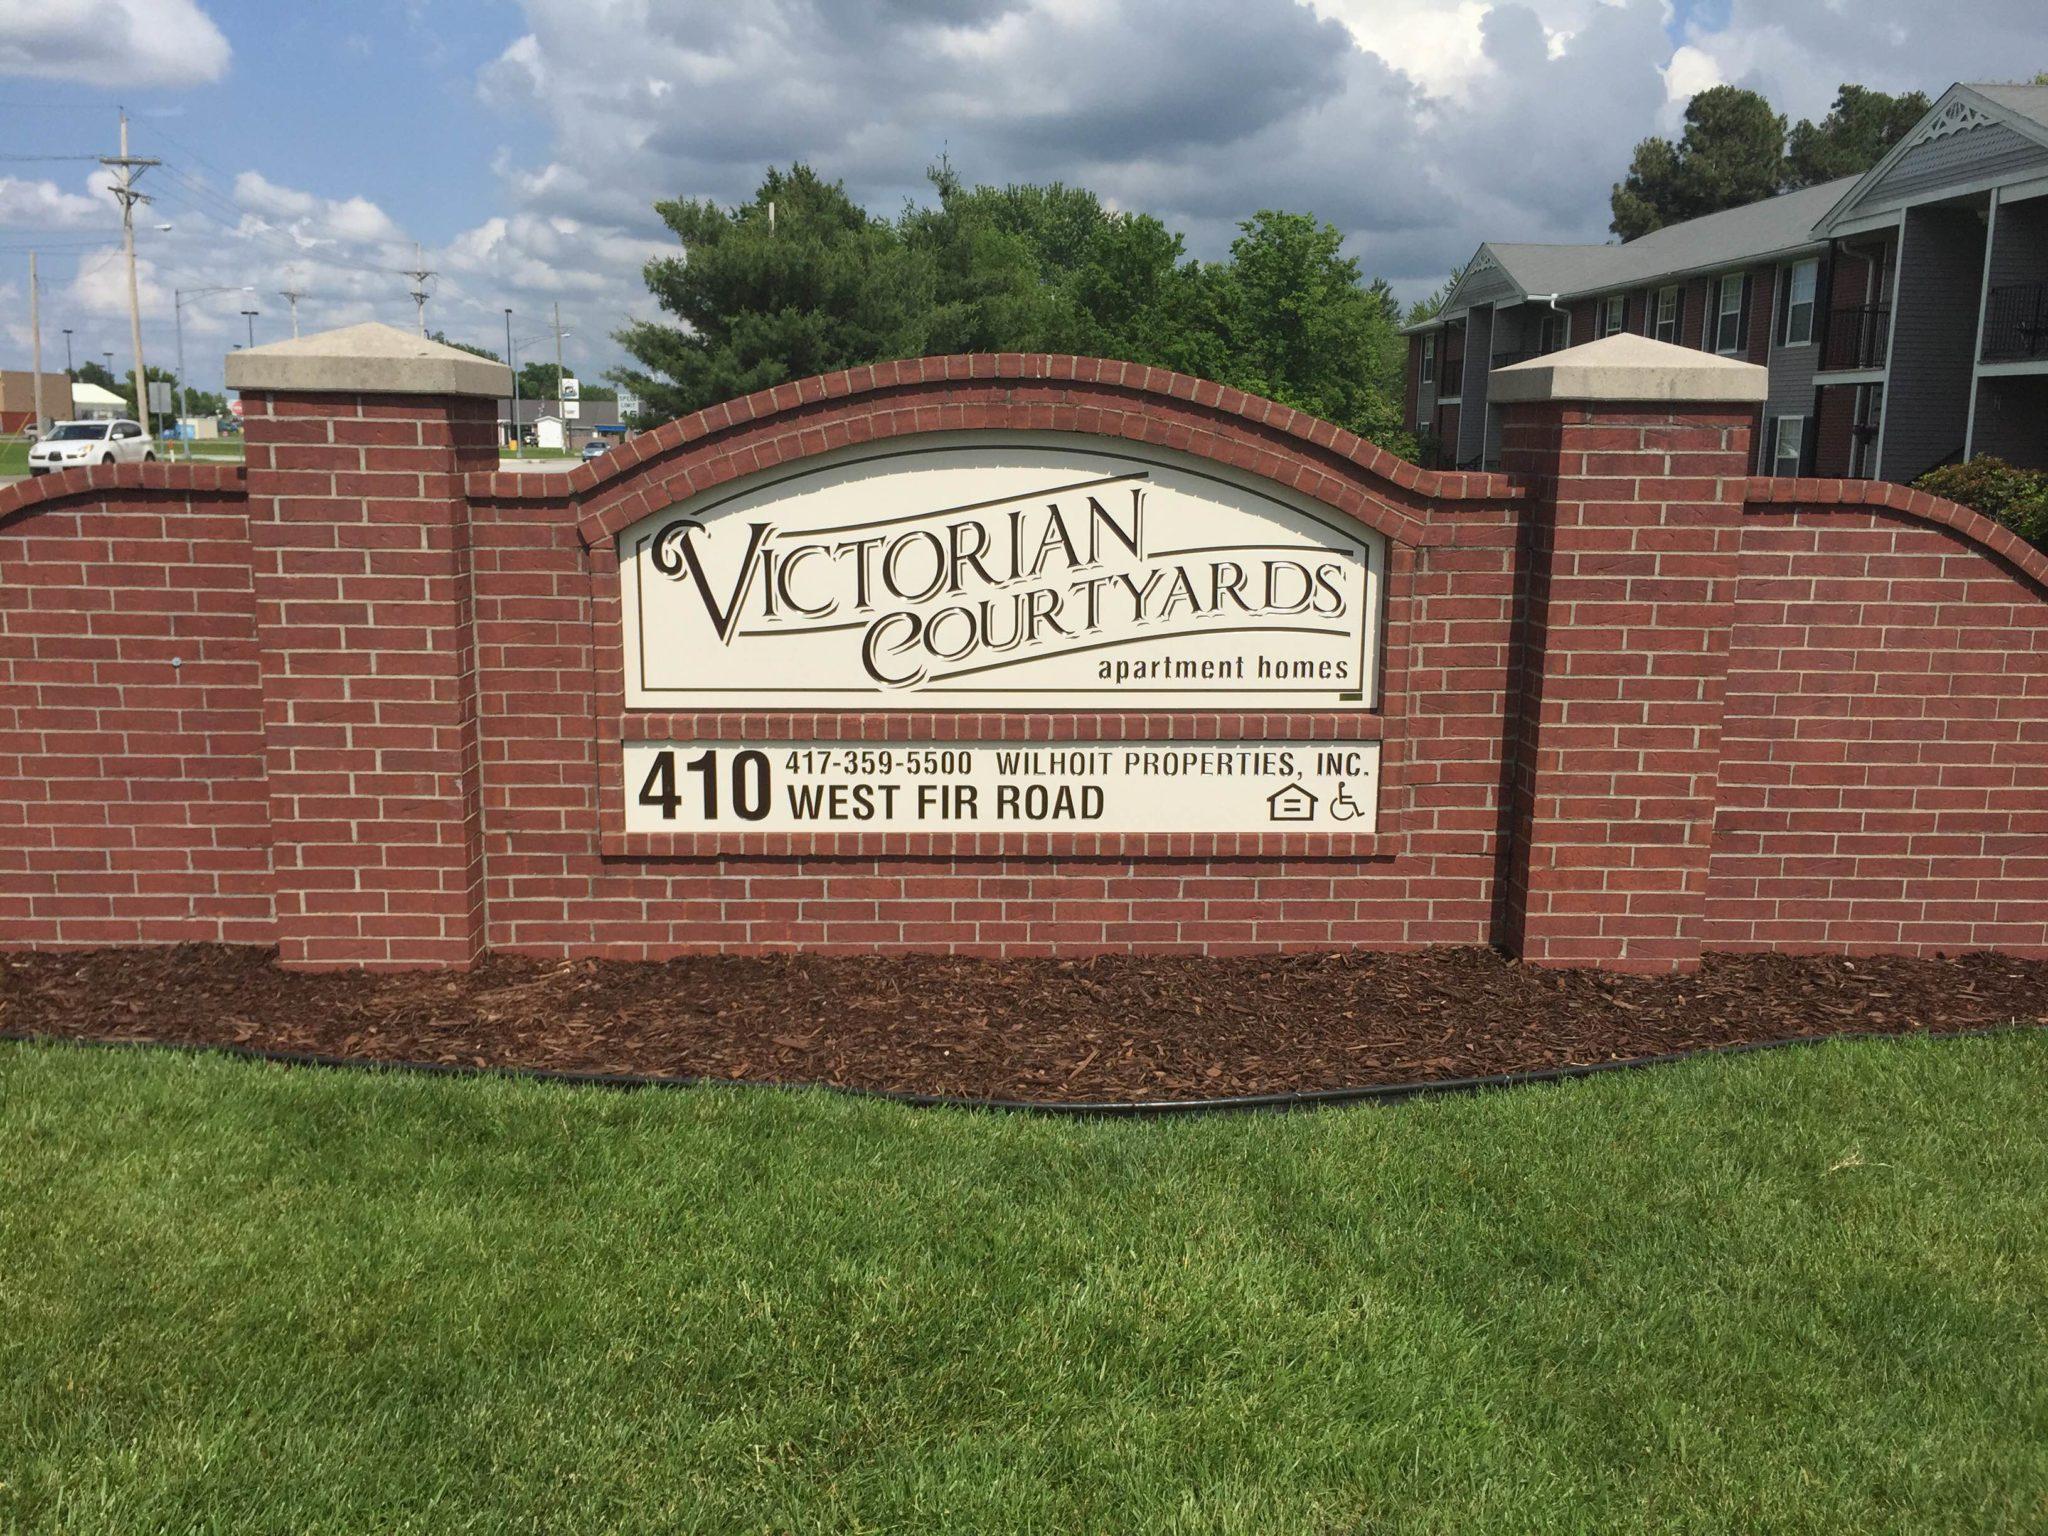 Victorian Couryard Carthage Missouri sign IMG_0123 (4)